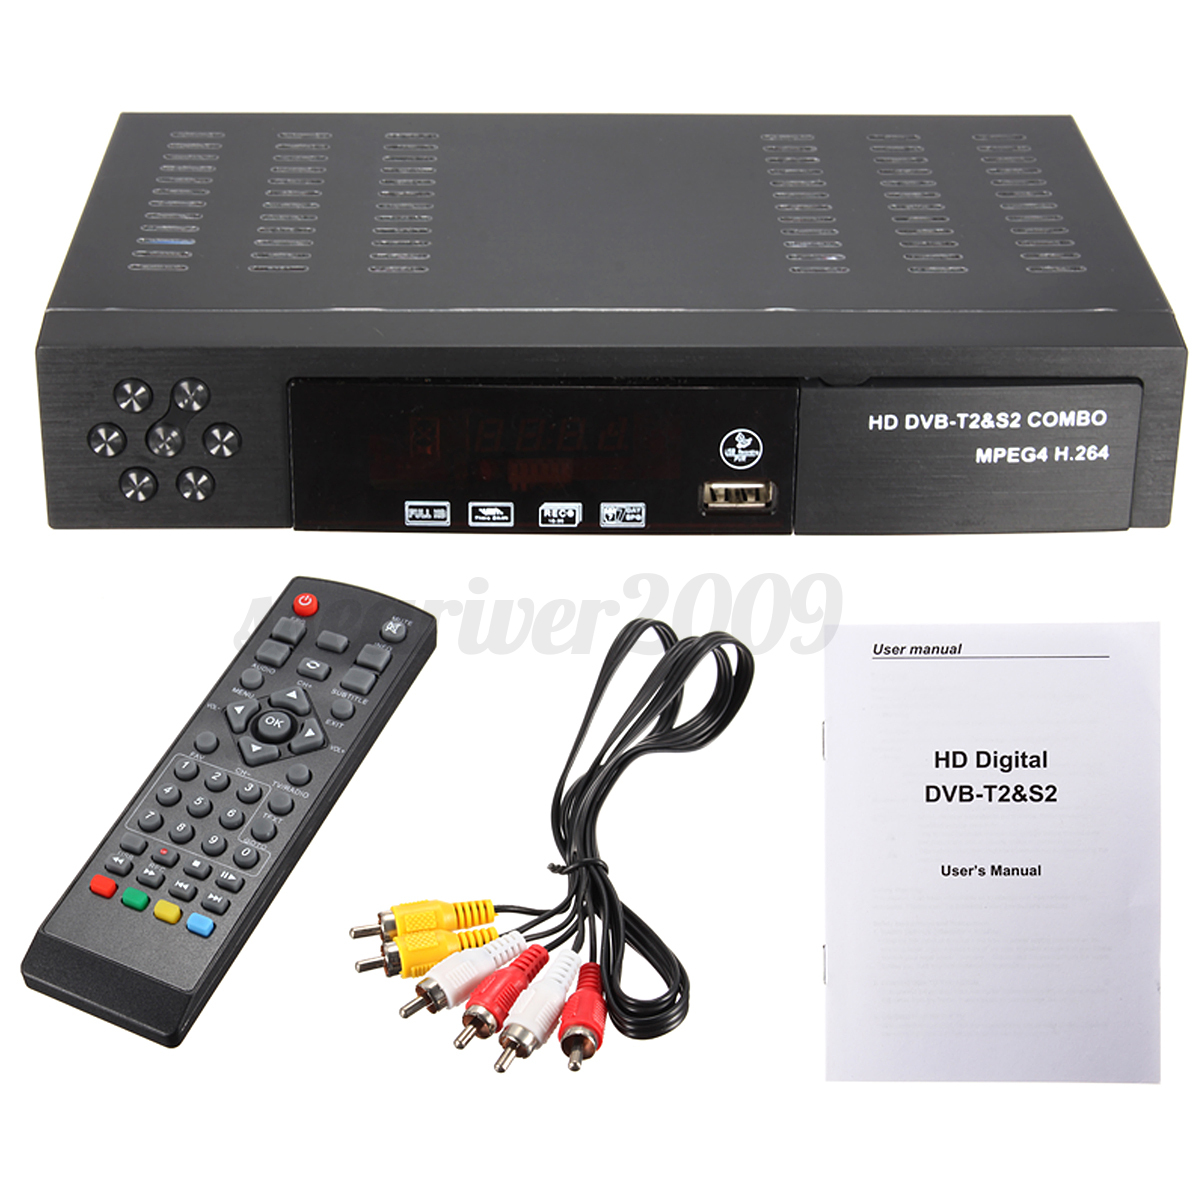 eu full hd 1080p dvb t2 s2 video broadcasting satellite receiver tv hdtv box. Black Bedroom Furniture Sets. Home Design Ideas